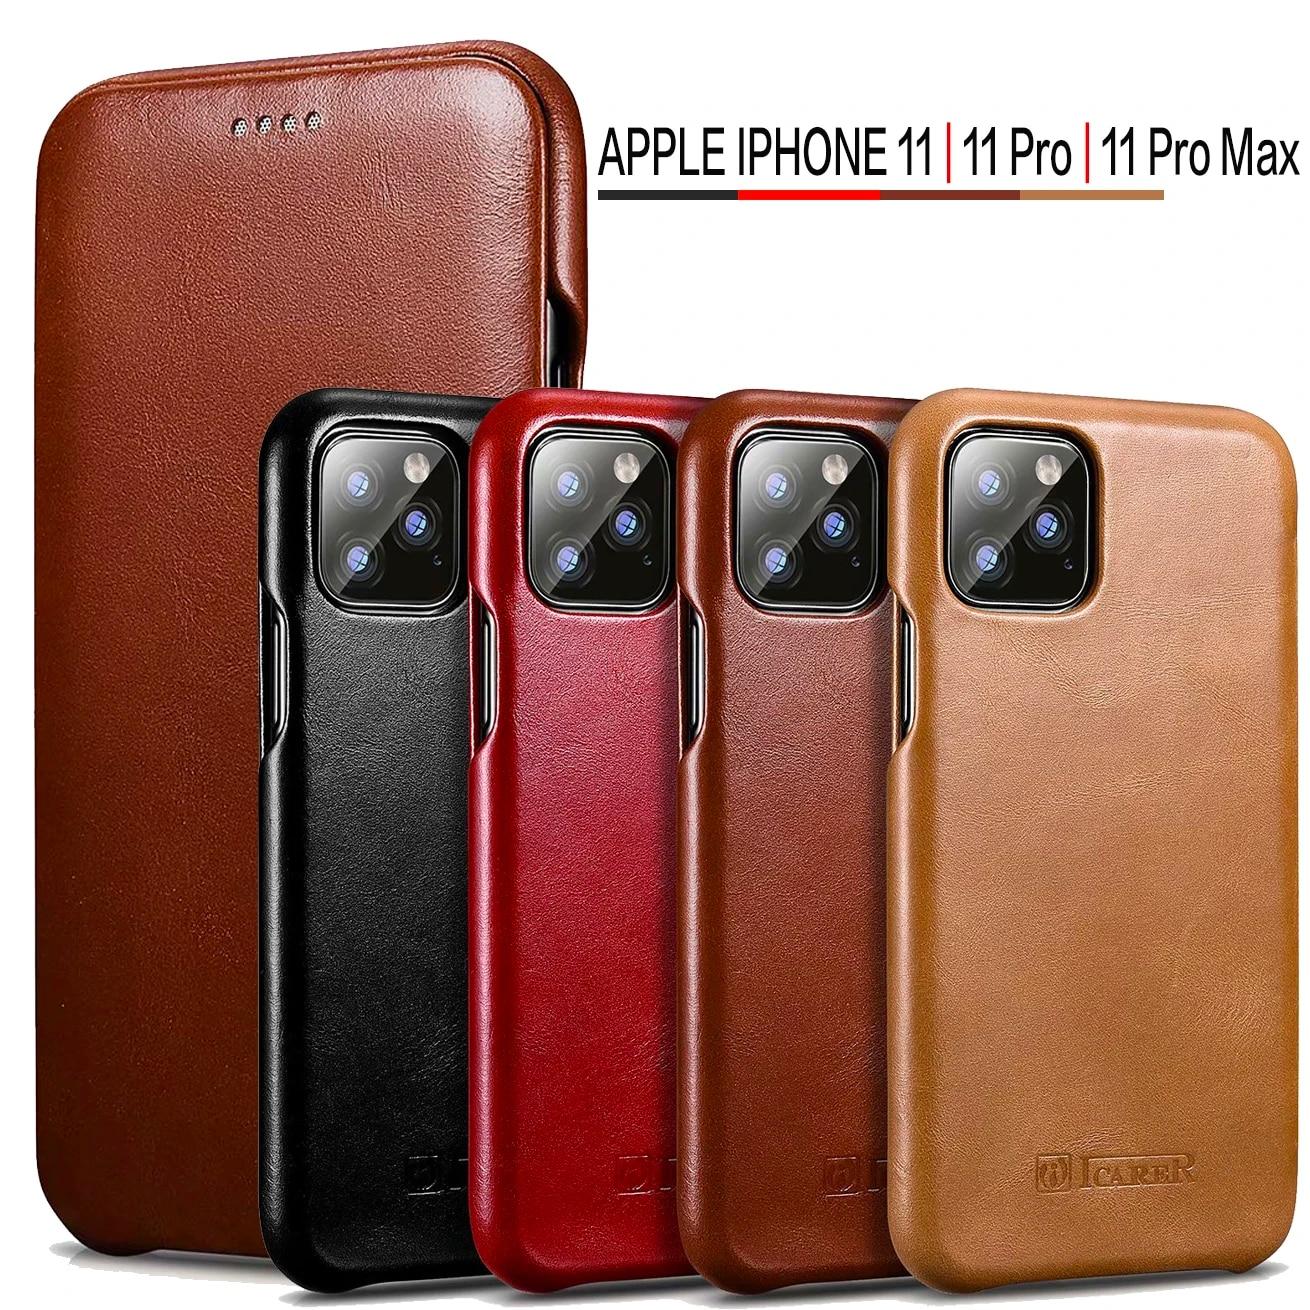 For Apple iPhone 11   11 Pro   11 Pro Max 100% Original iCarer